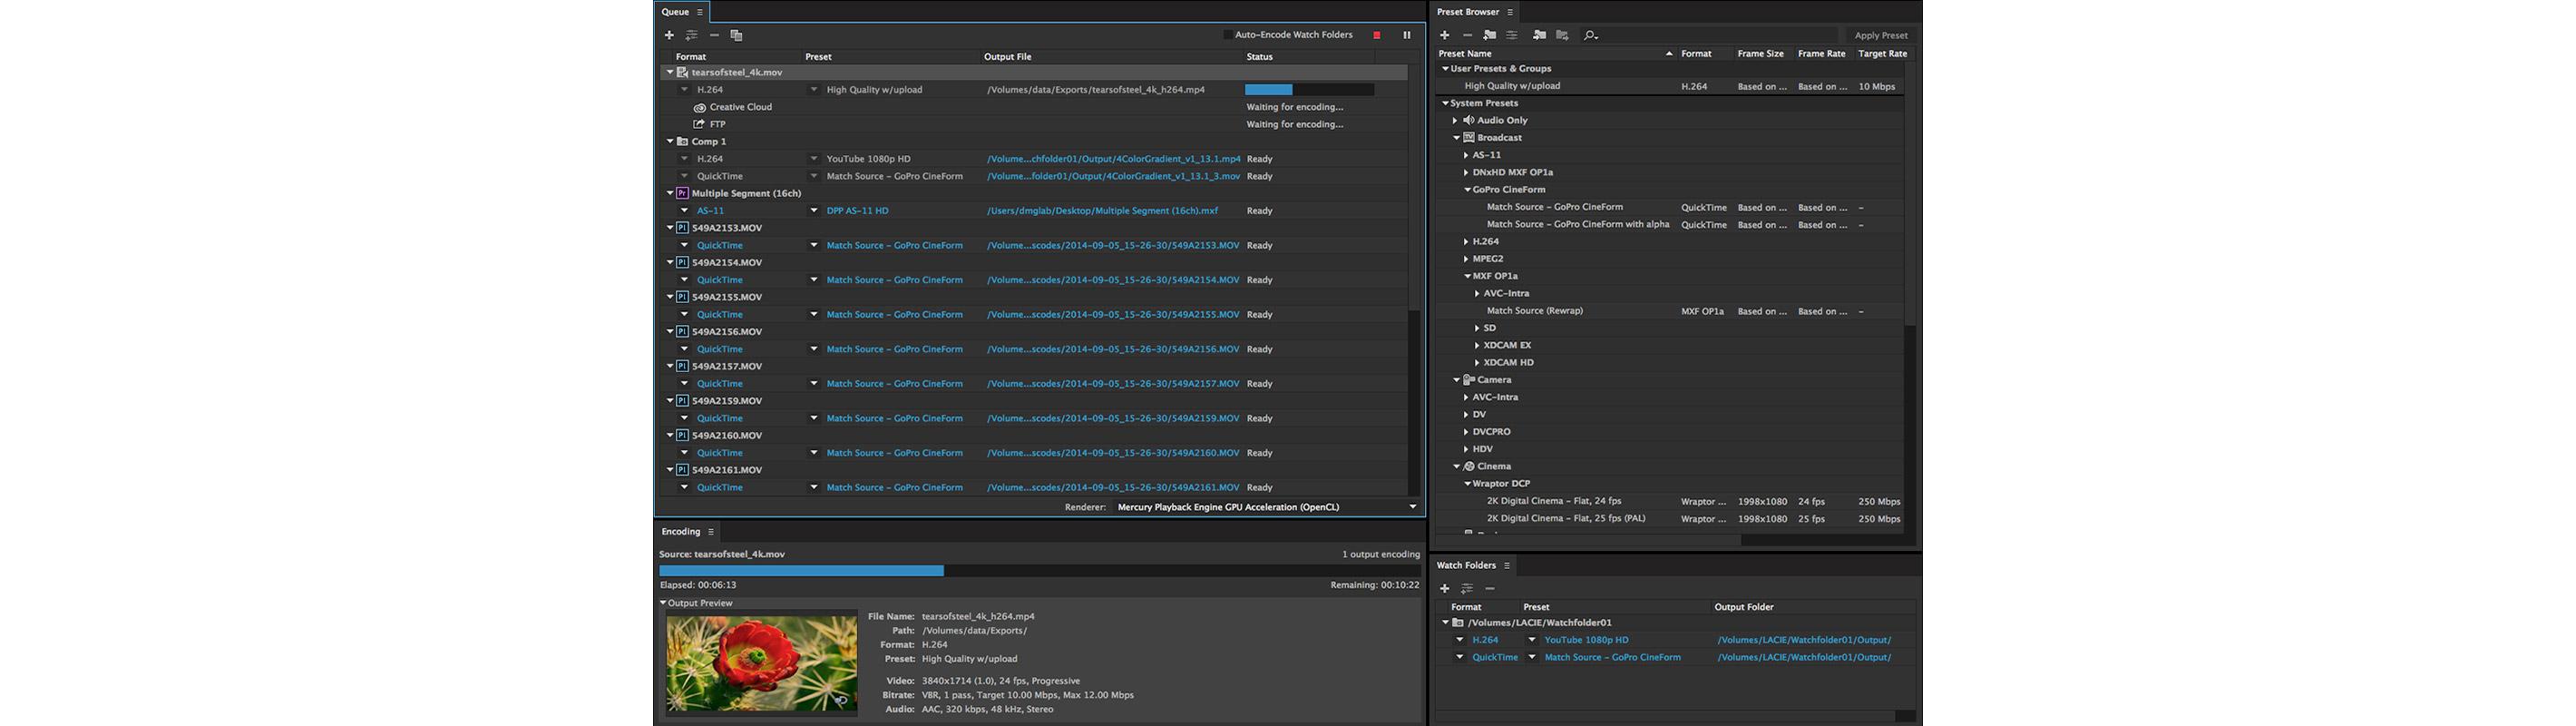 Media Encoder CC Demo - Media Encoder CC